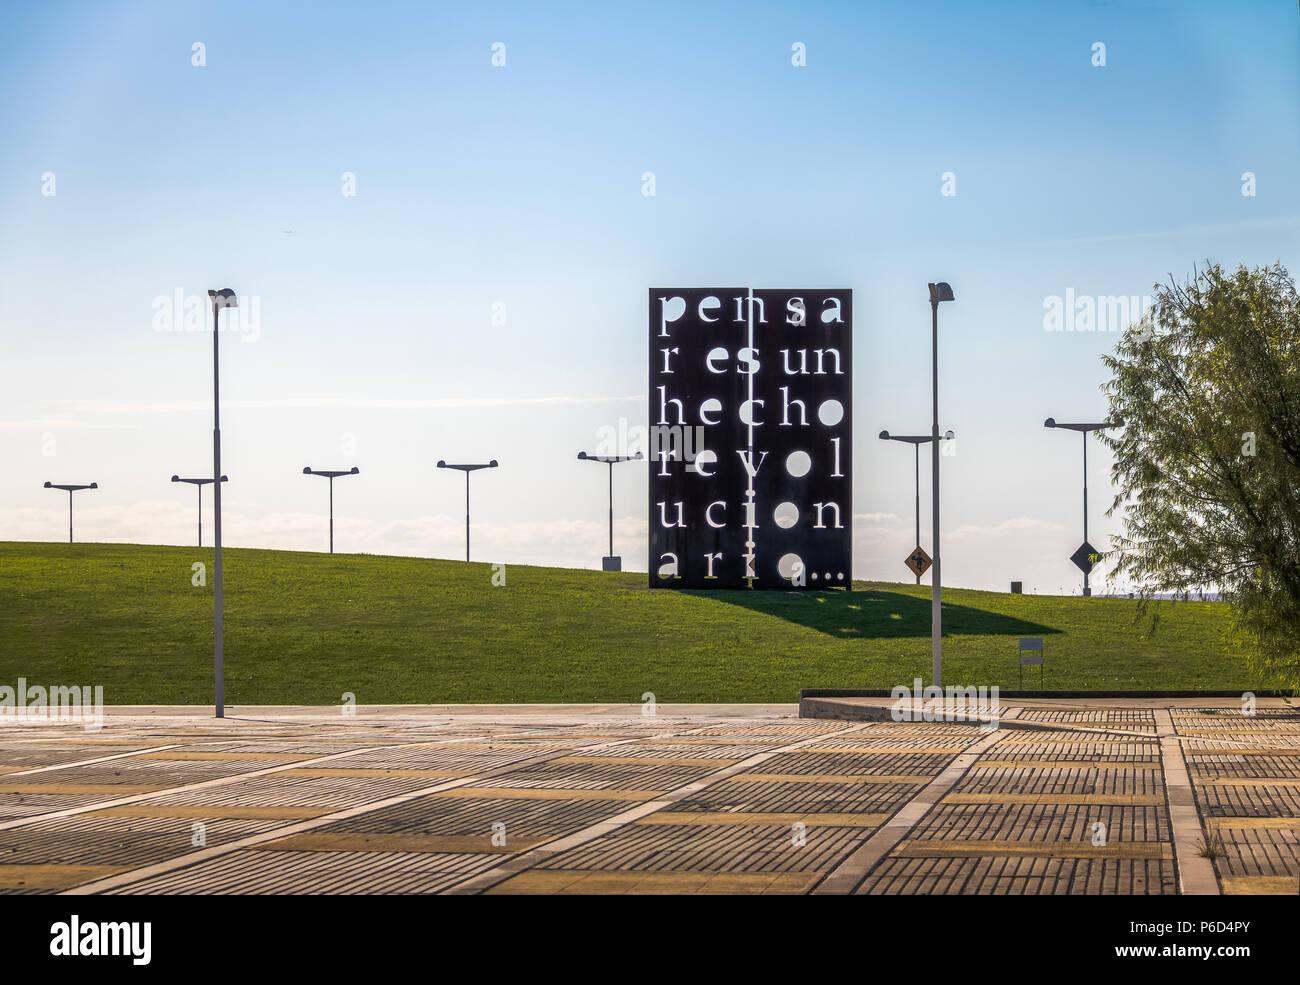 Parque De La Memoria Memory Park Park With Monuments Dedicated To